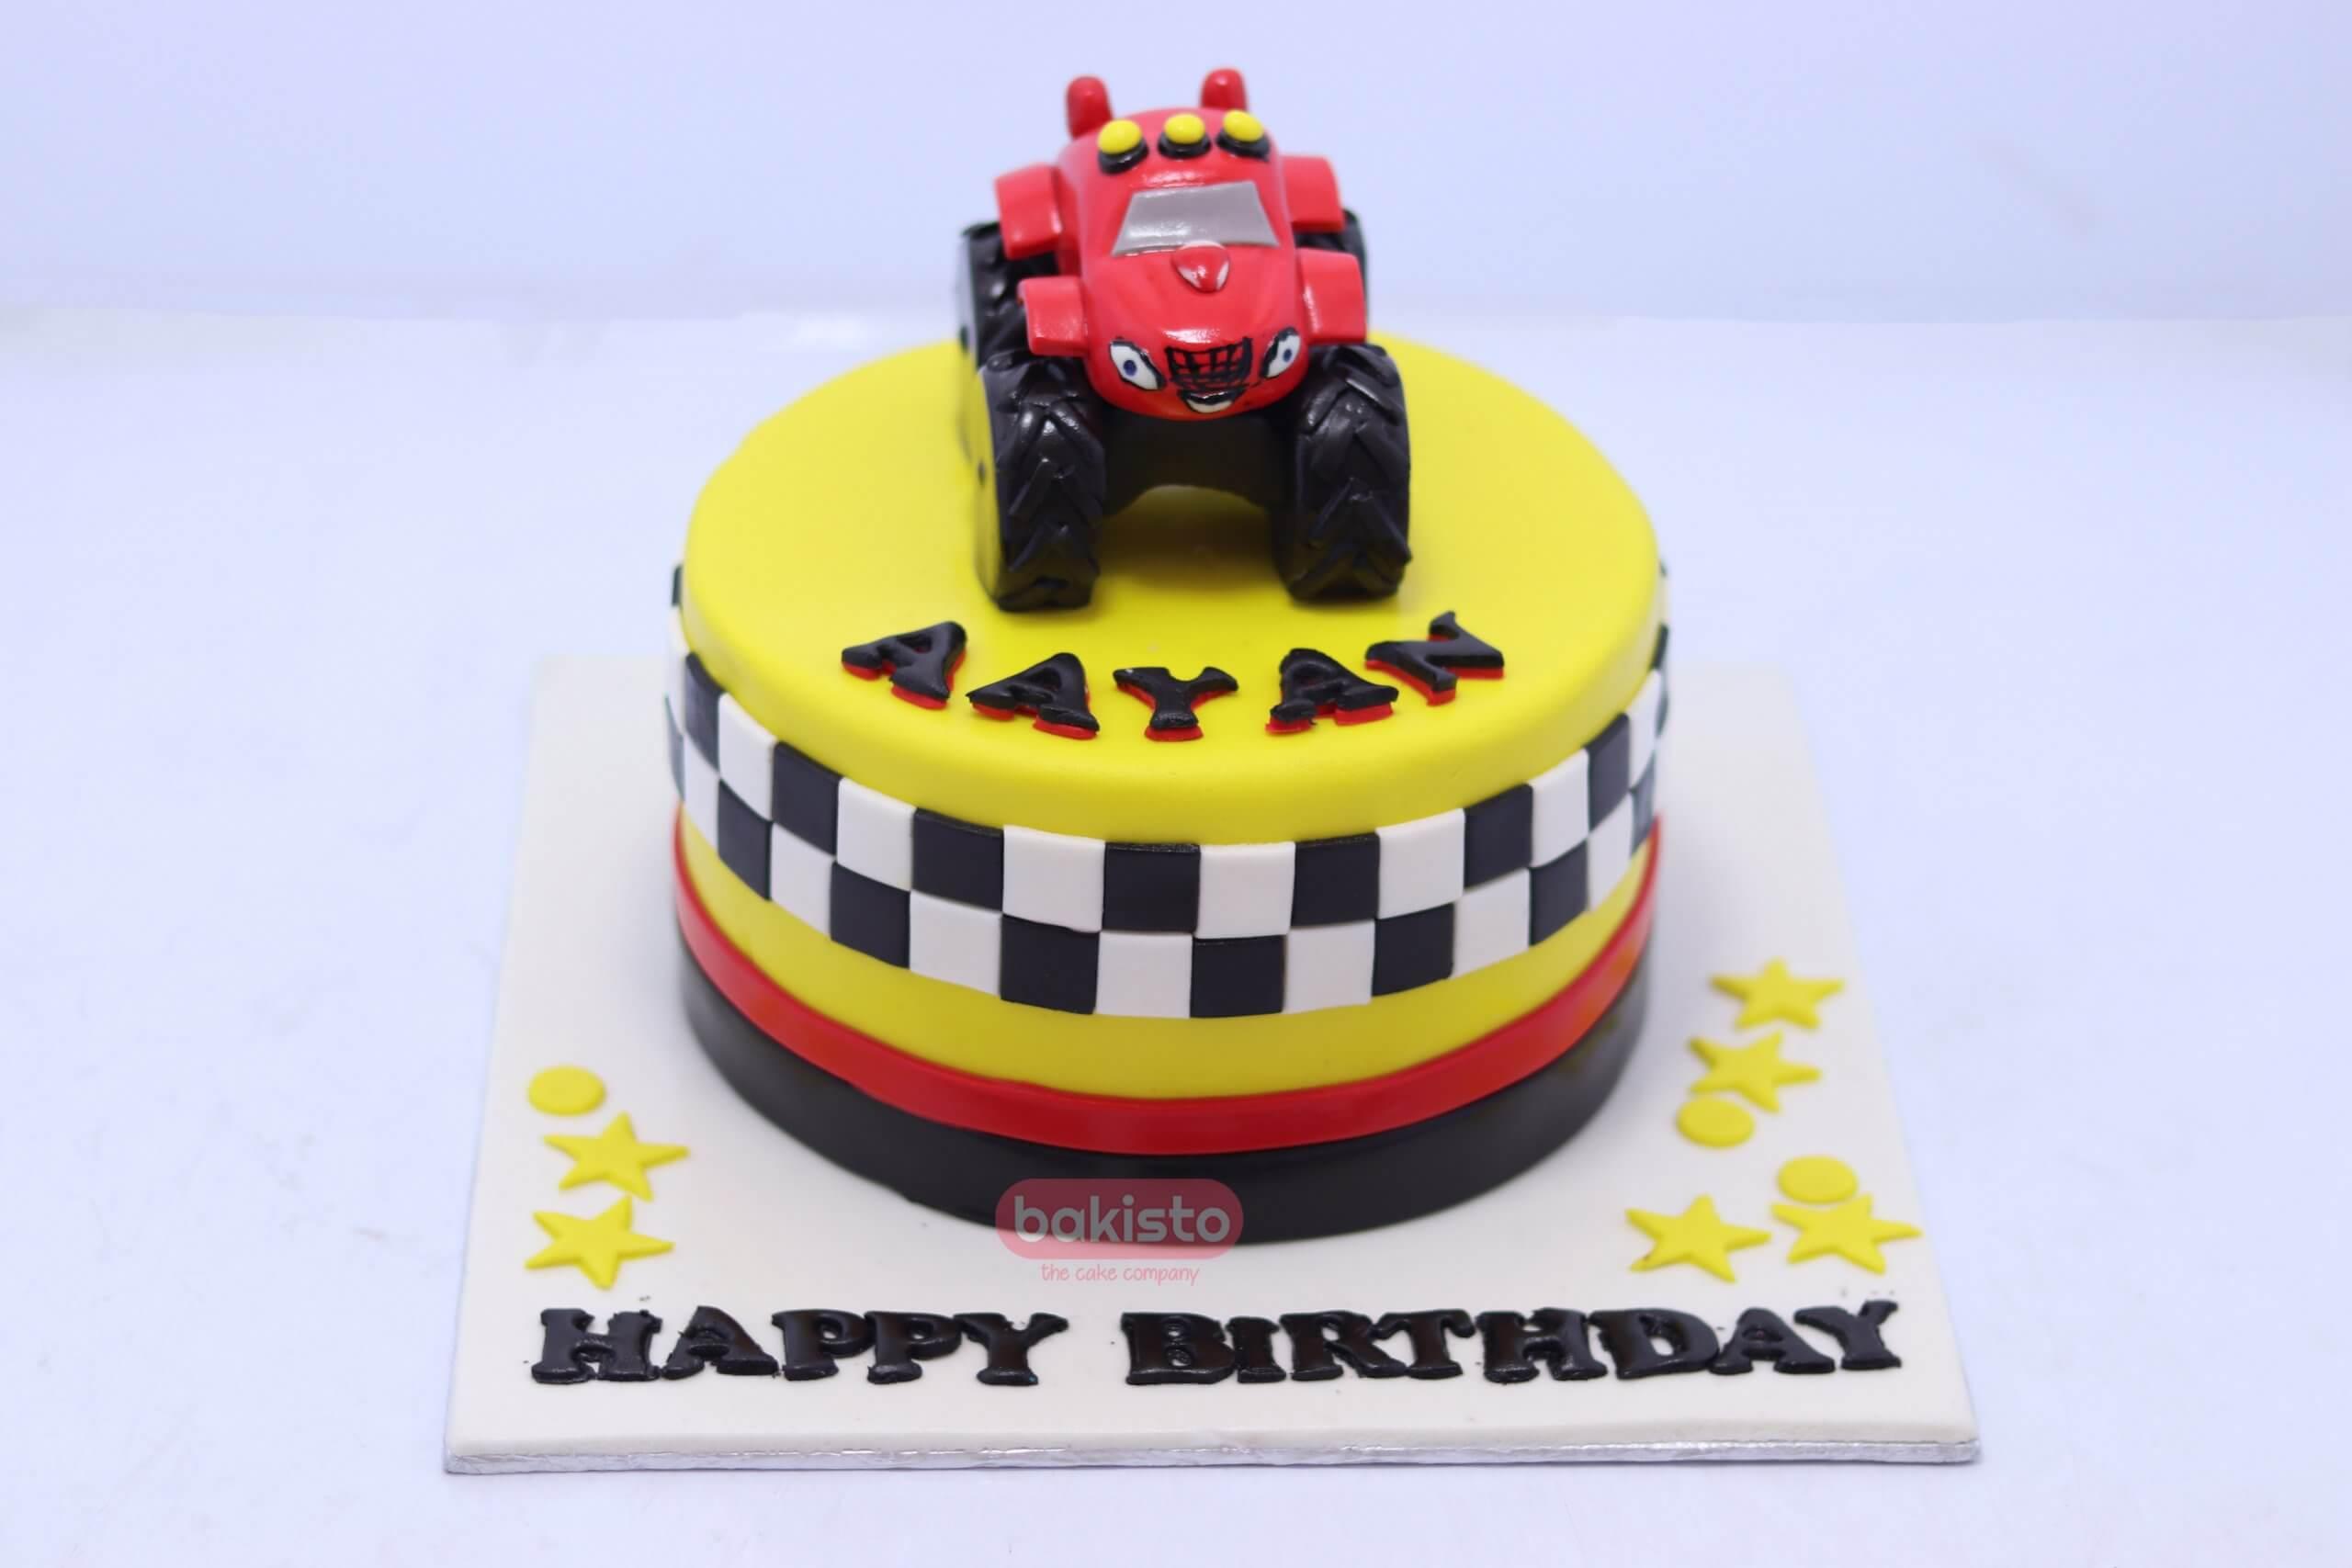 | baby shower cakes, fresh fruit recipes, cute. Yellow Car Birthday Cake Bakisto Pk Birthday Cake In Pakistan